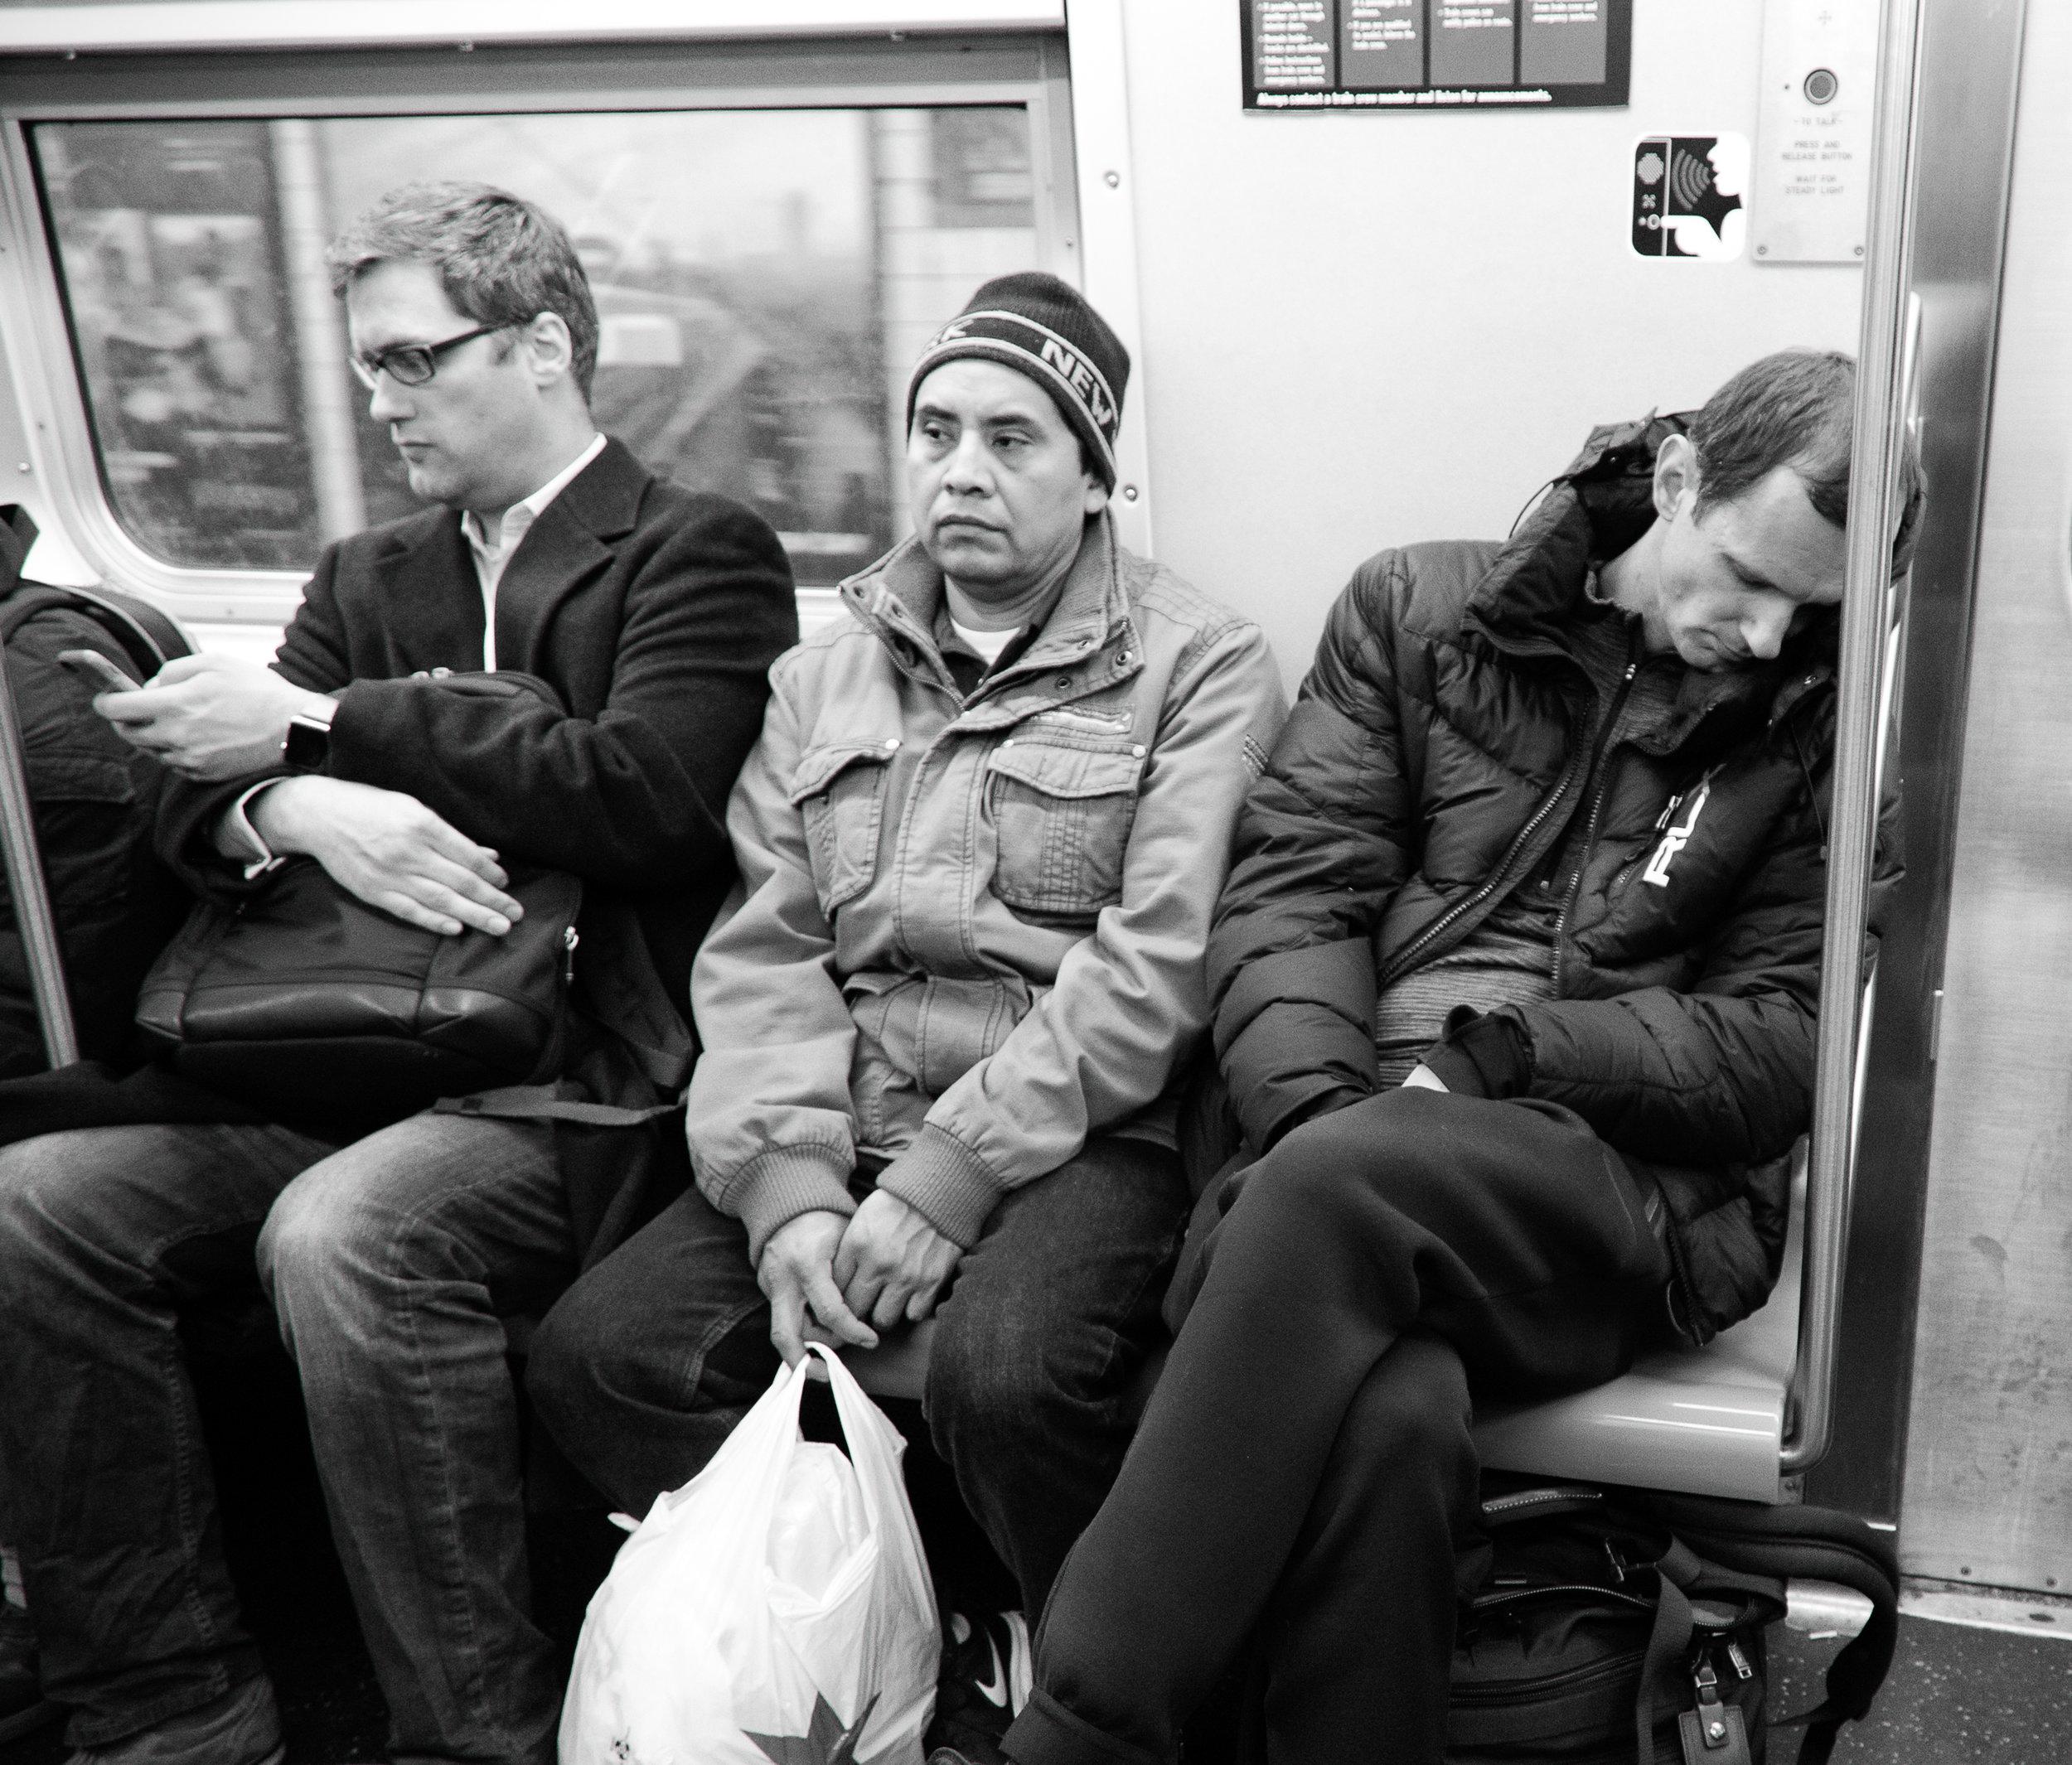 sloan_h_NYC_001.jpg